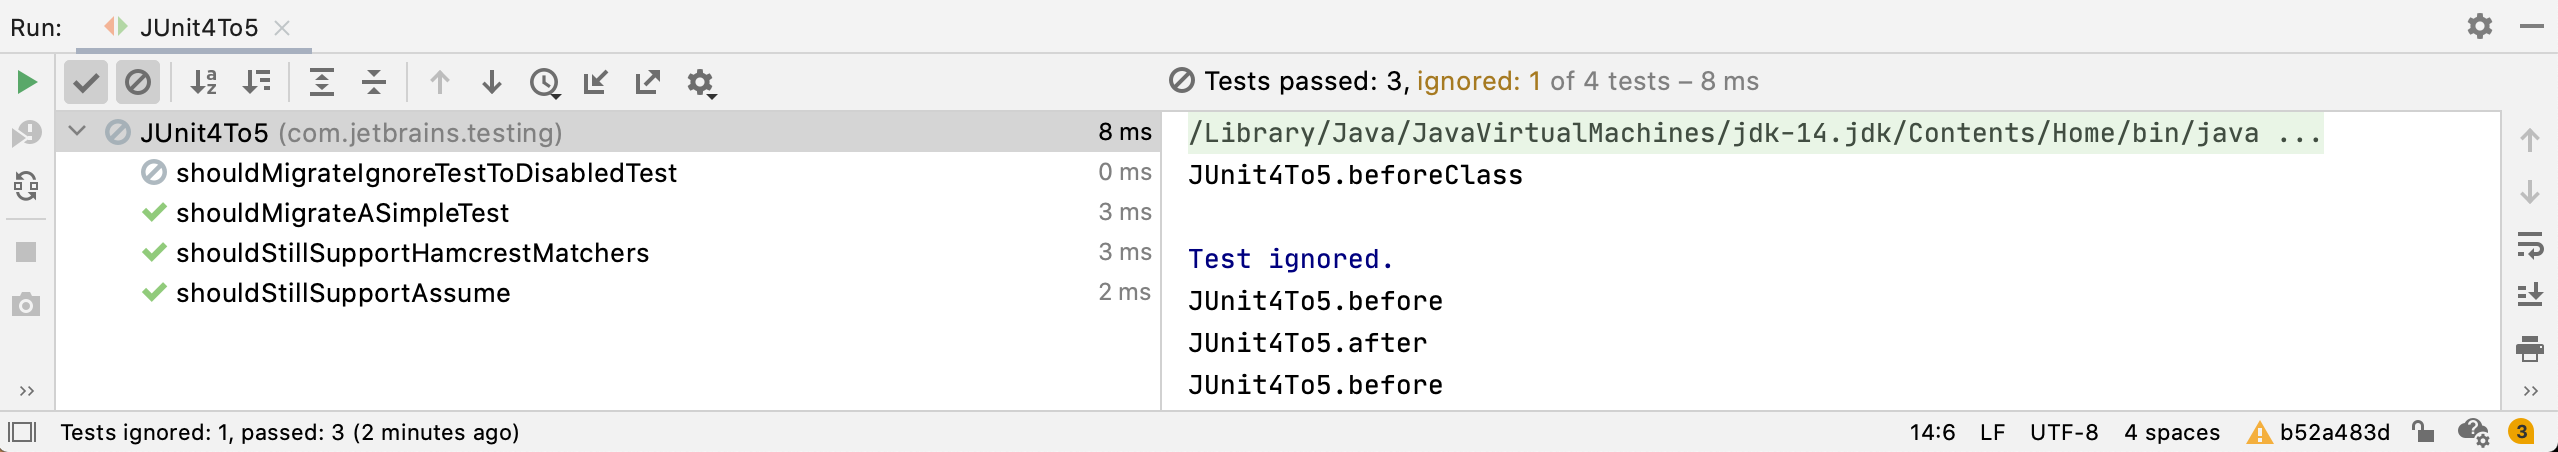 Test Run Window IntelliJ